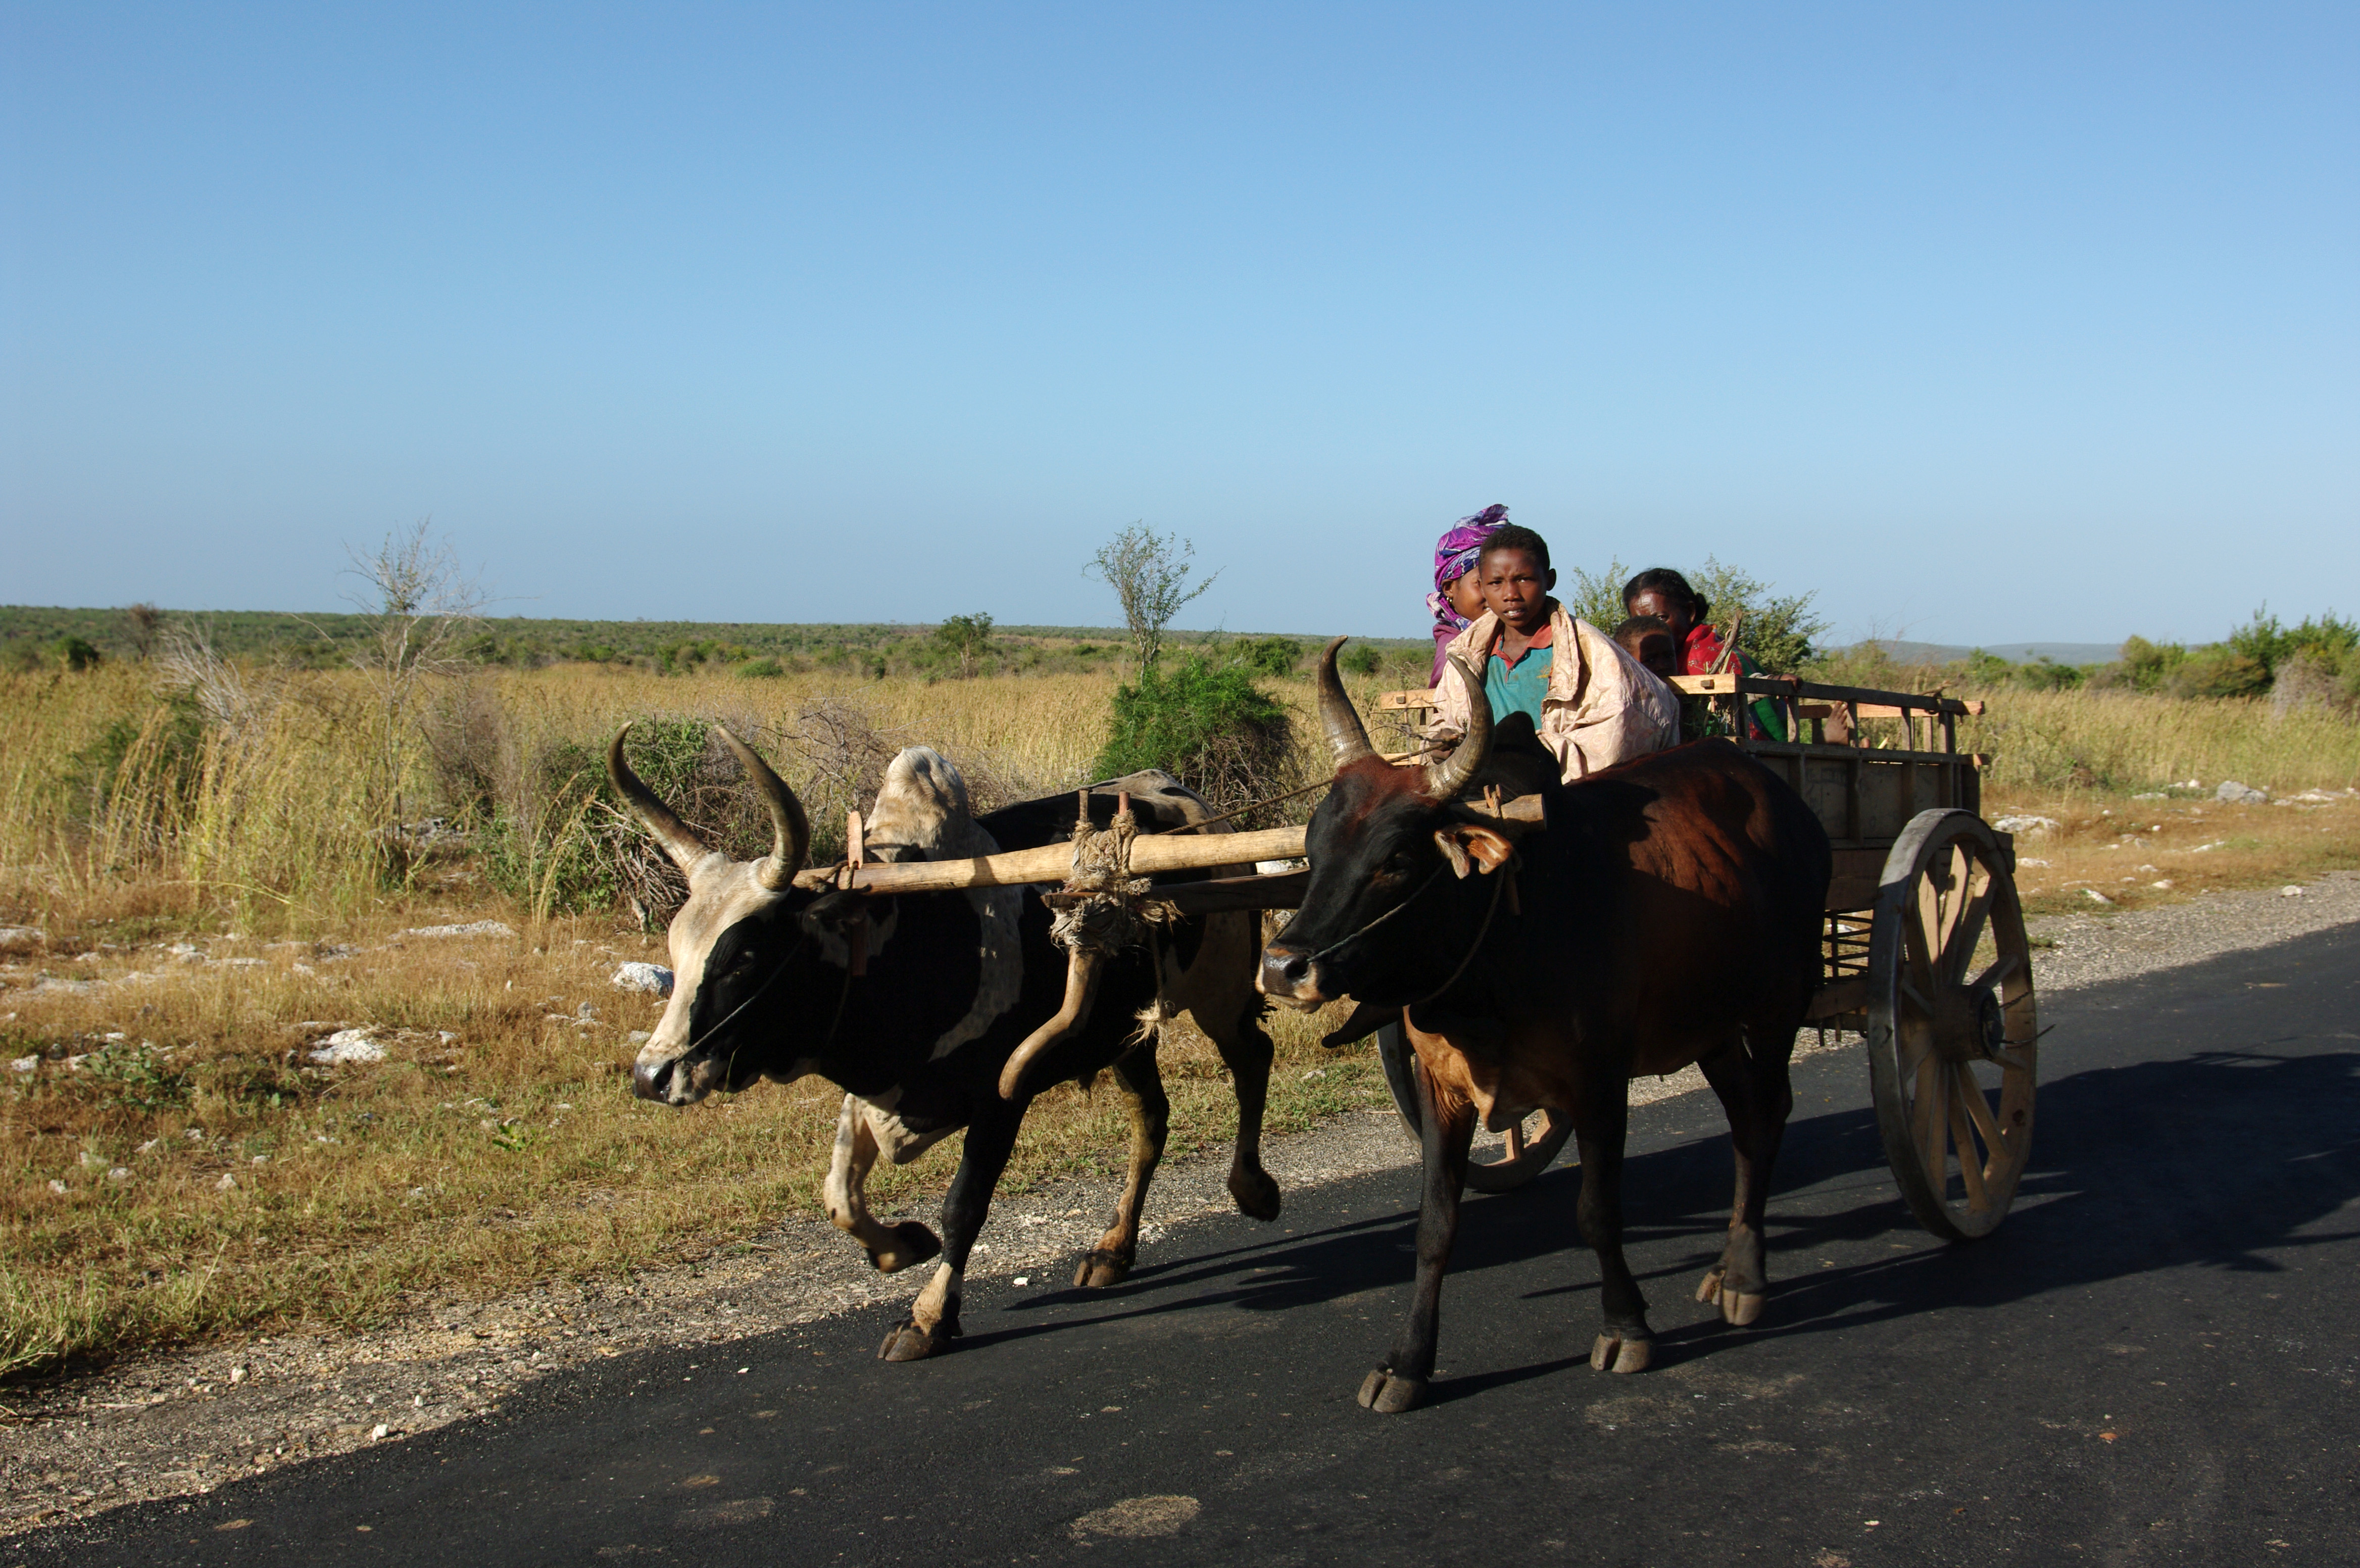 Ochsenkarren-als-Transport - Madagaskar- Steib-Pur-Reisen